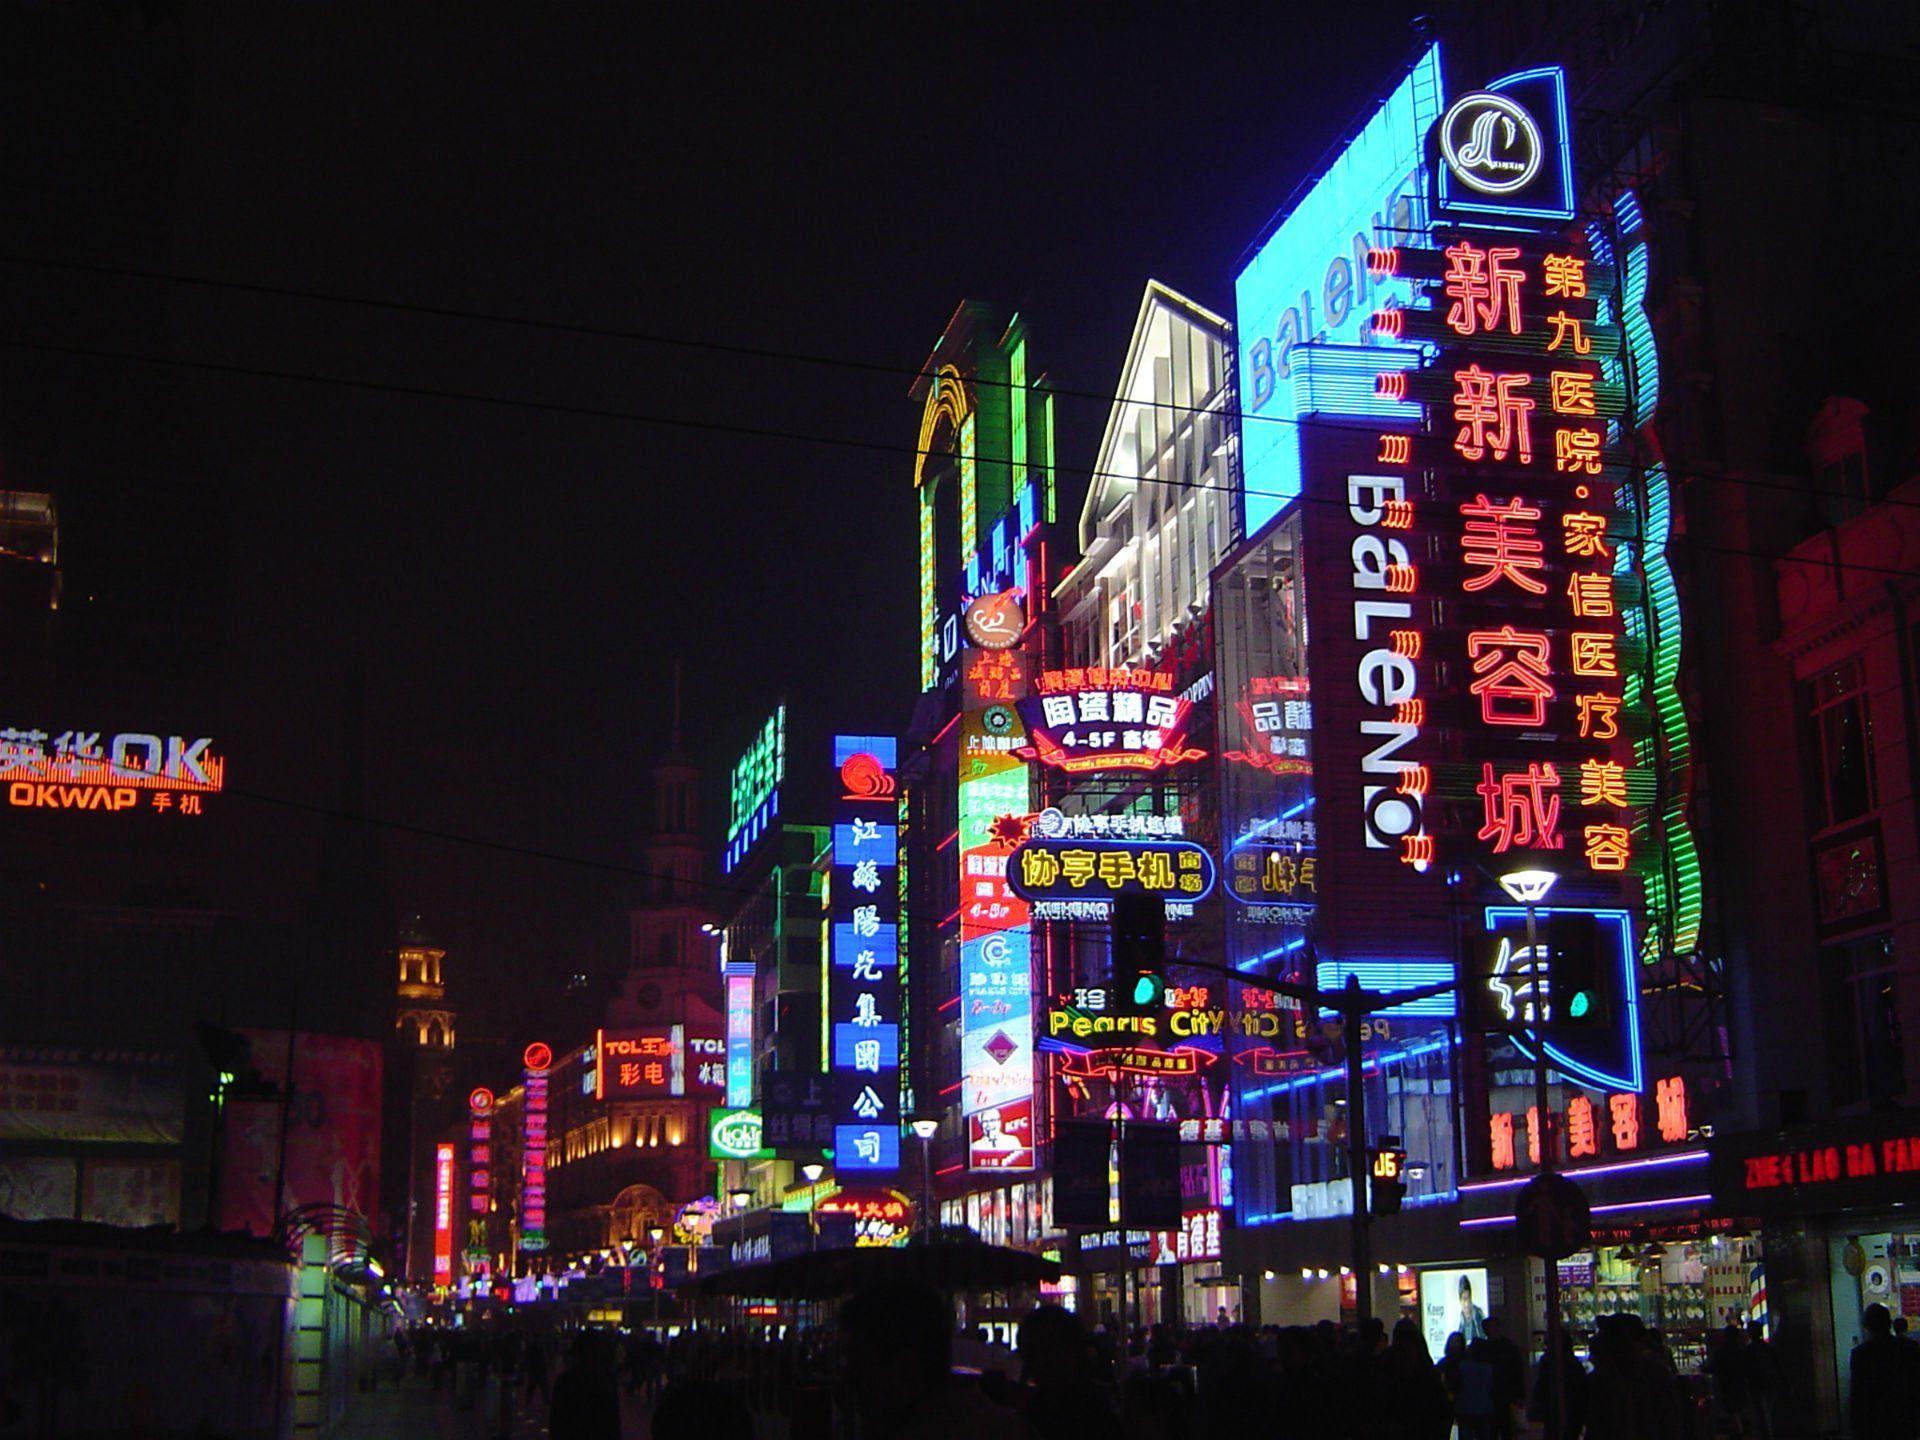 Neon Sign Aesthetic Desktop Wallpapers On Wallpaperdog